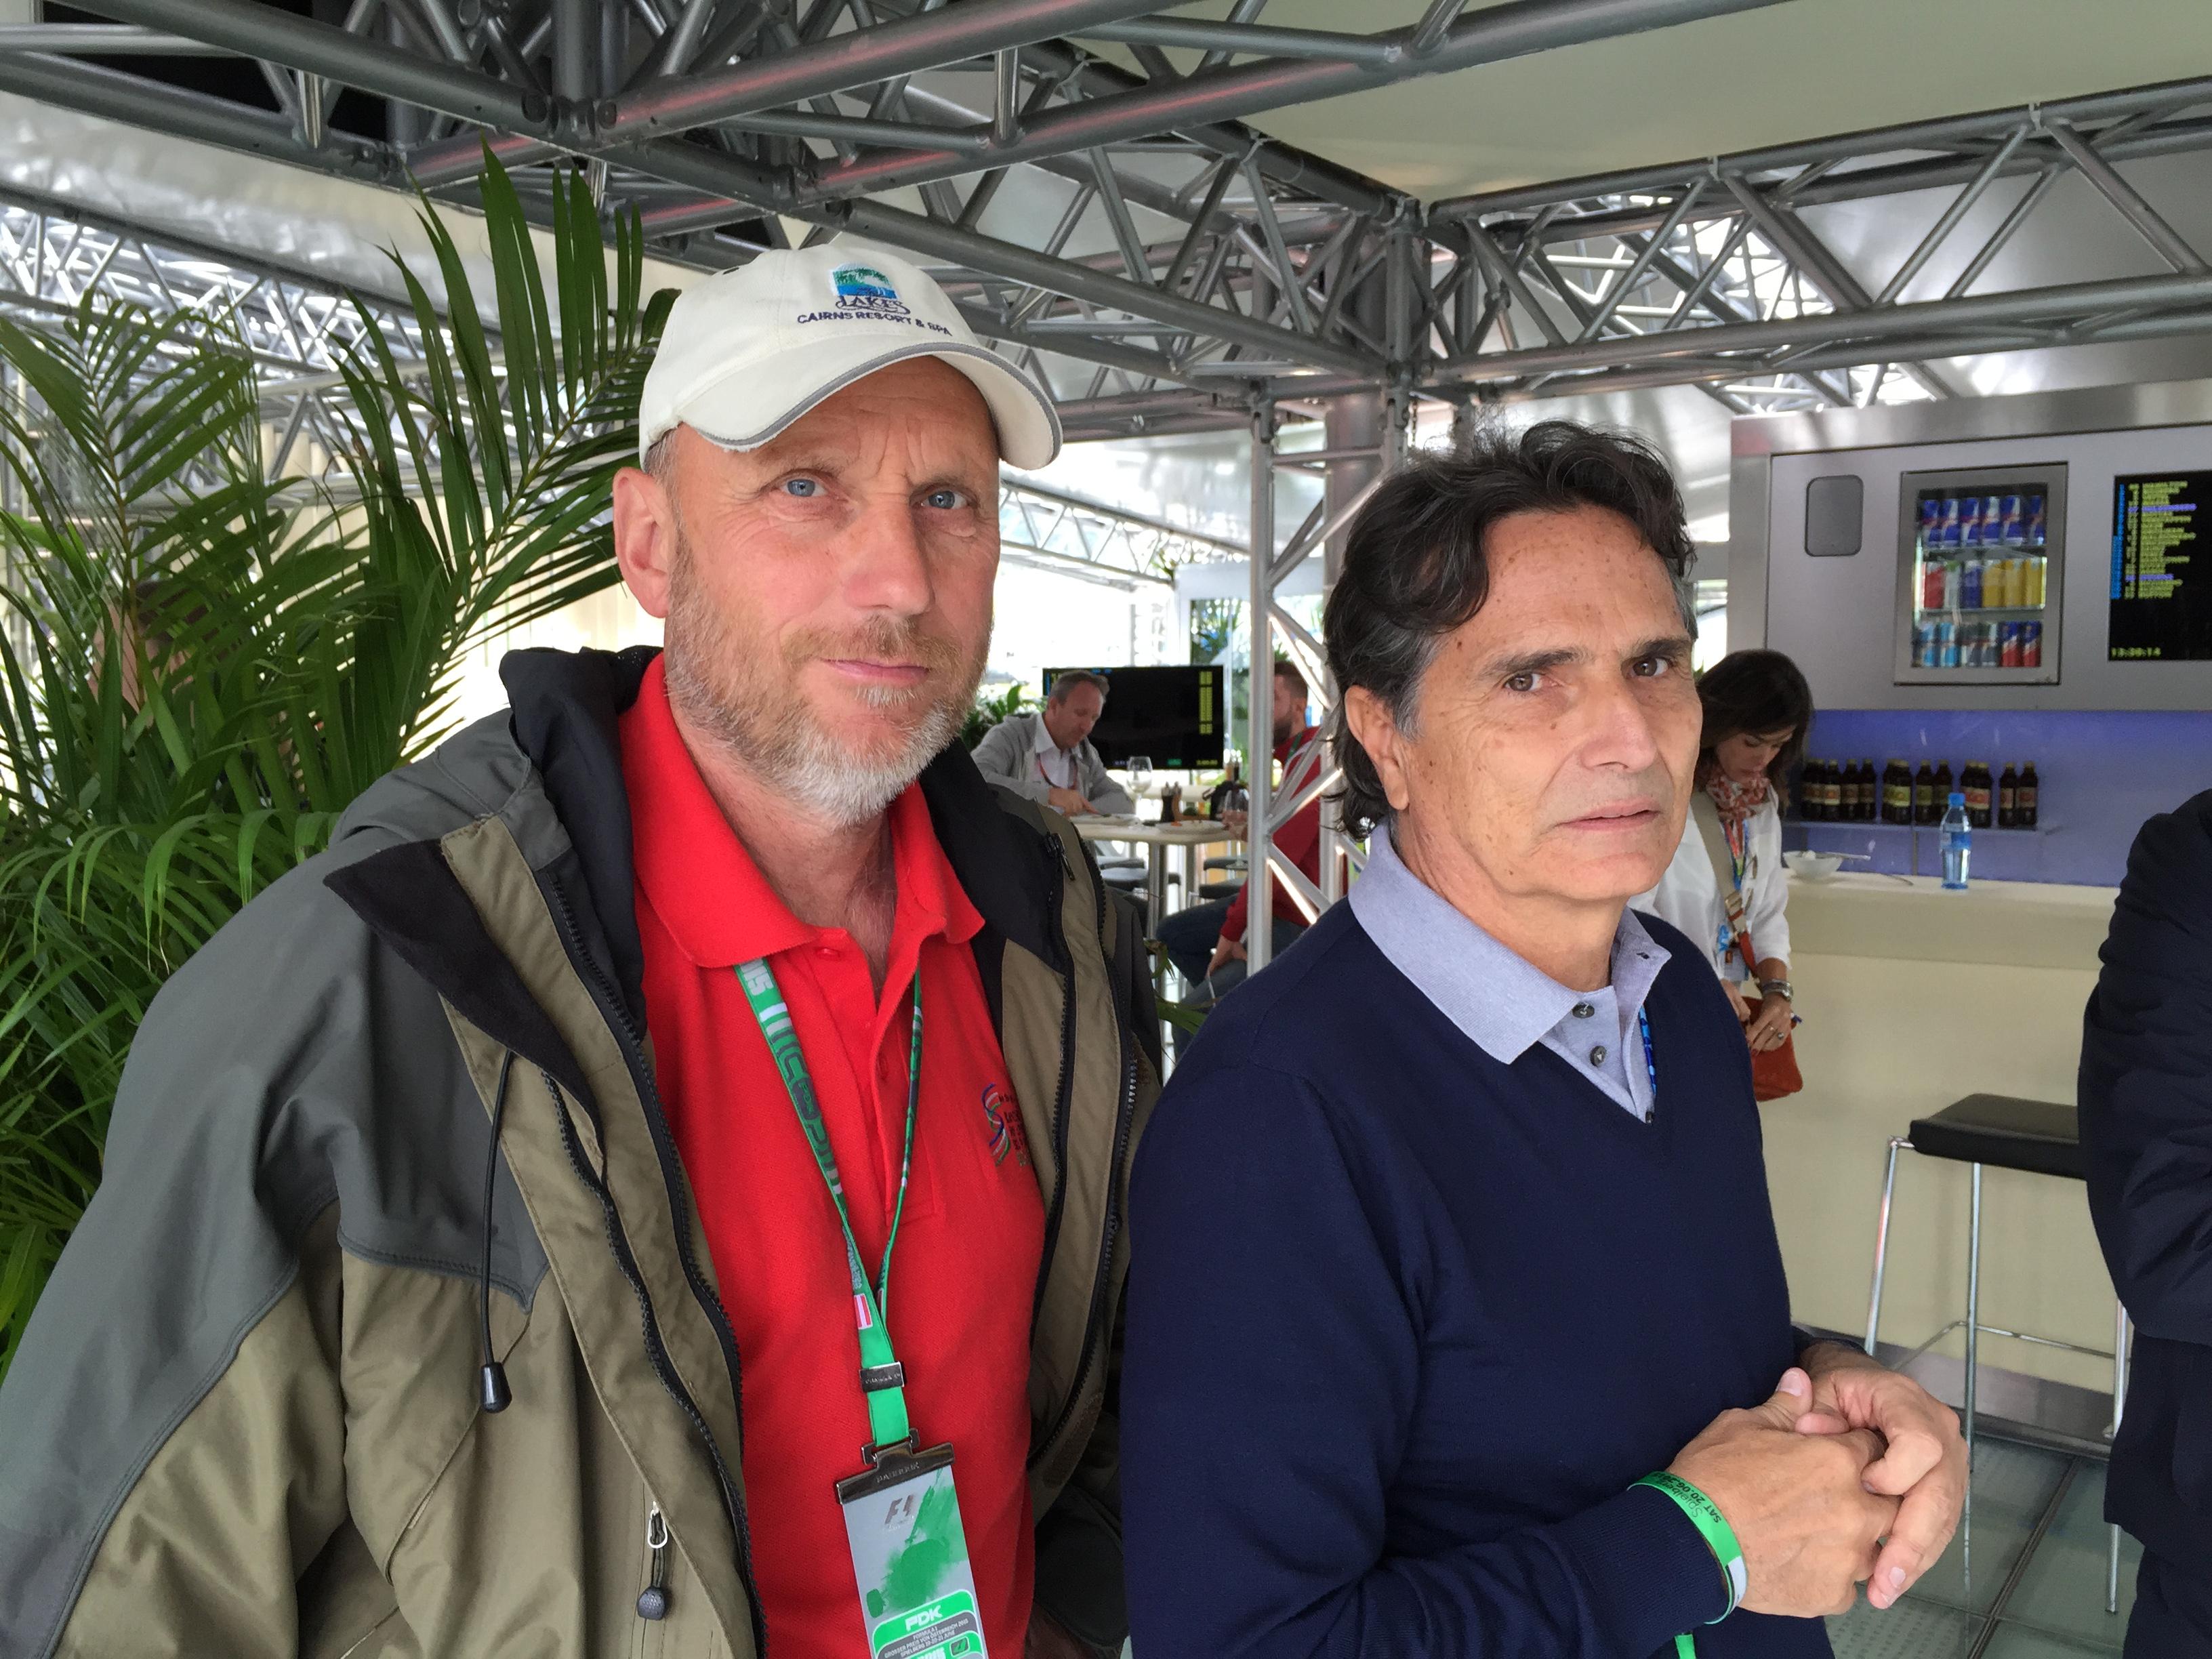 Formel 1 Spielberg: Emerson Fittipaldi